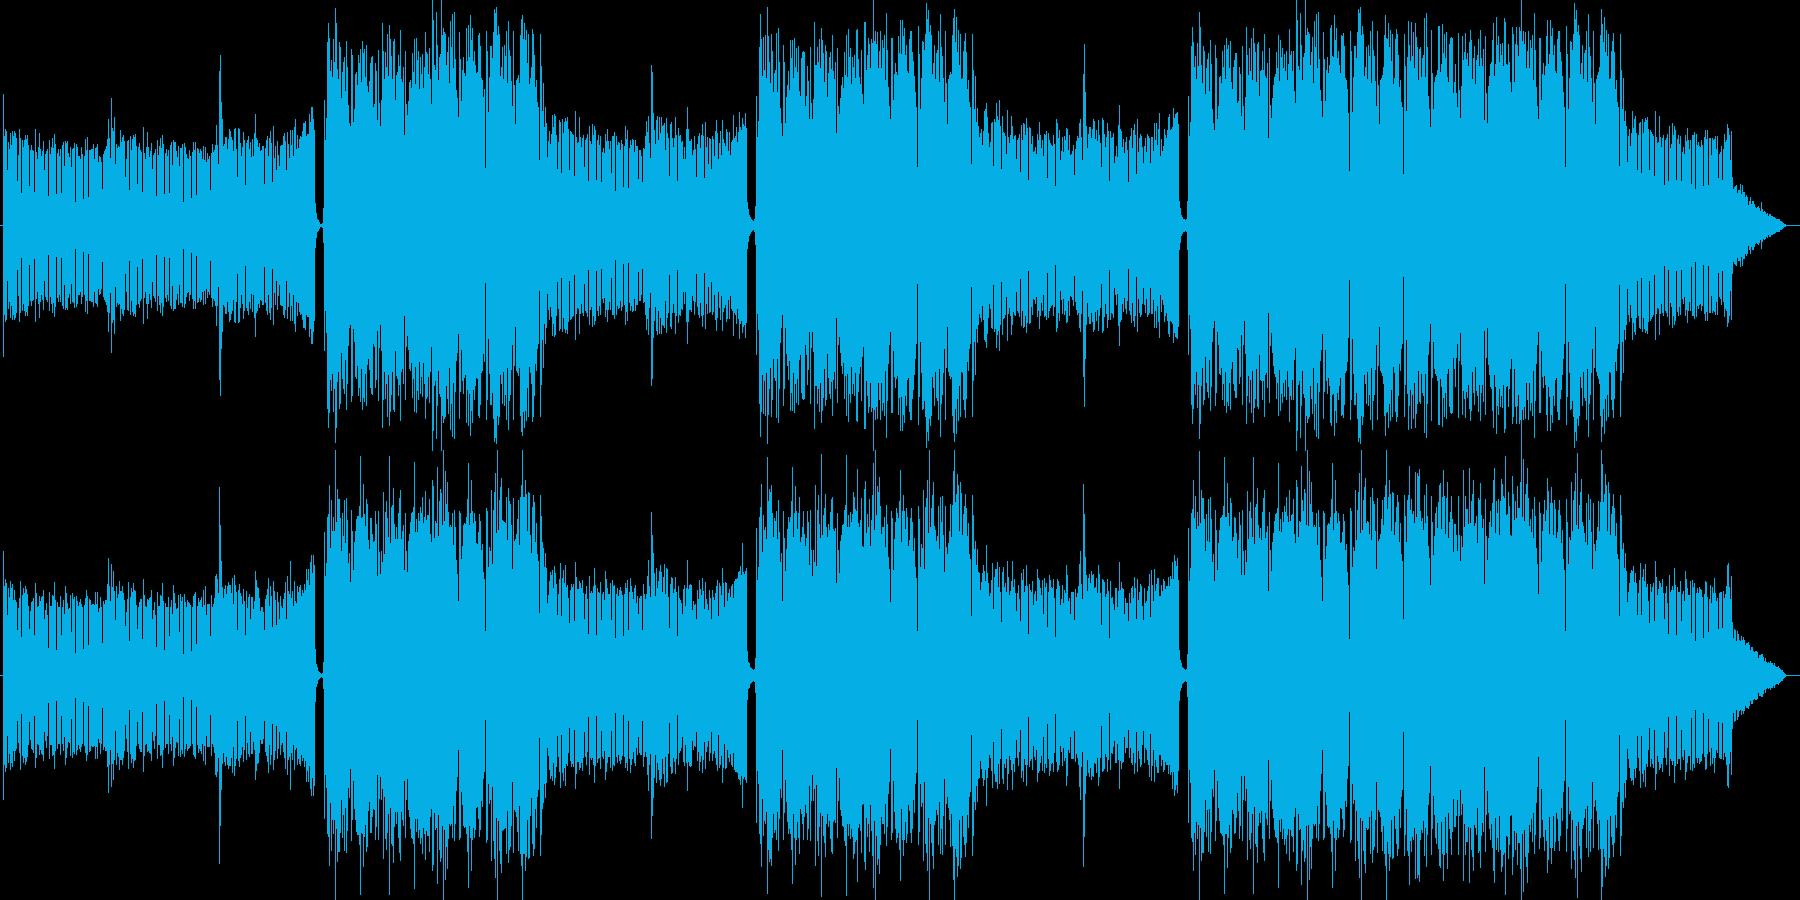 EDMクラブ系ダンスミュージック-10の再生済みの波形